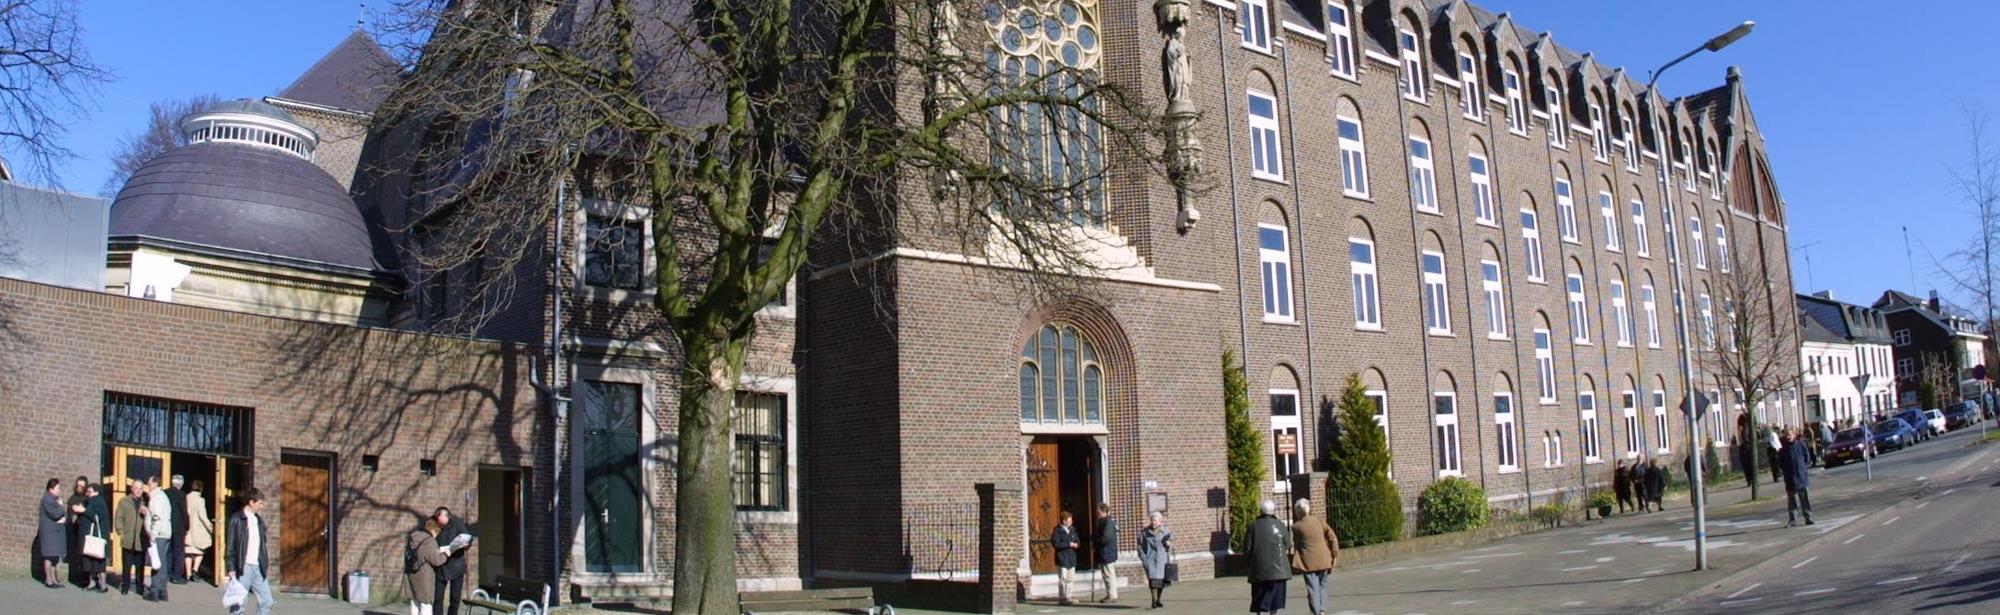 Kloosterbibliotheek Wittem